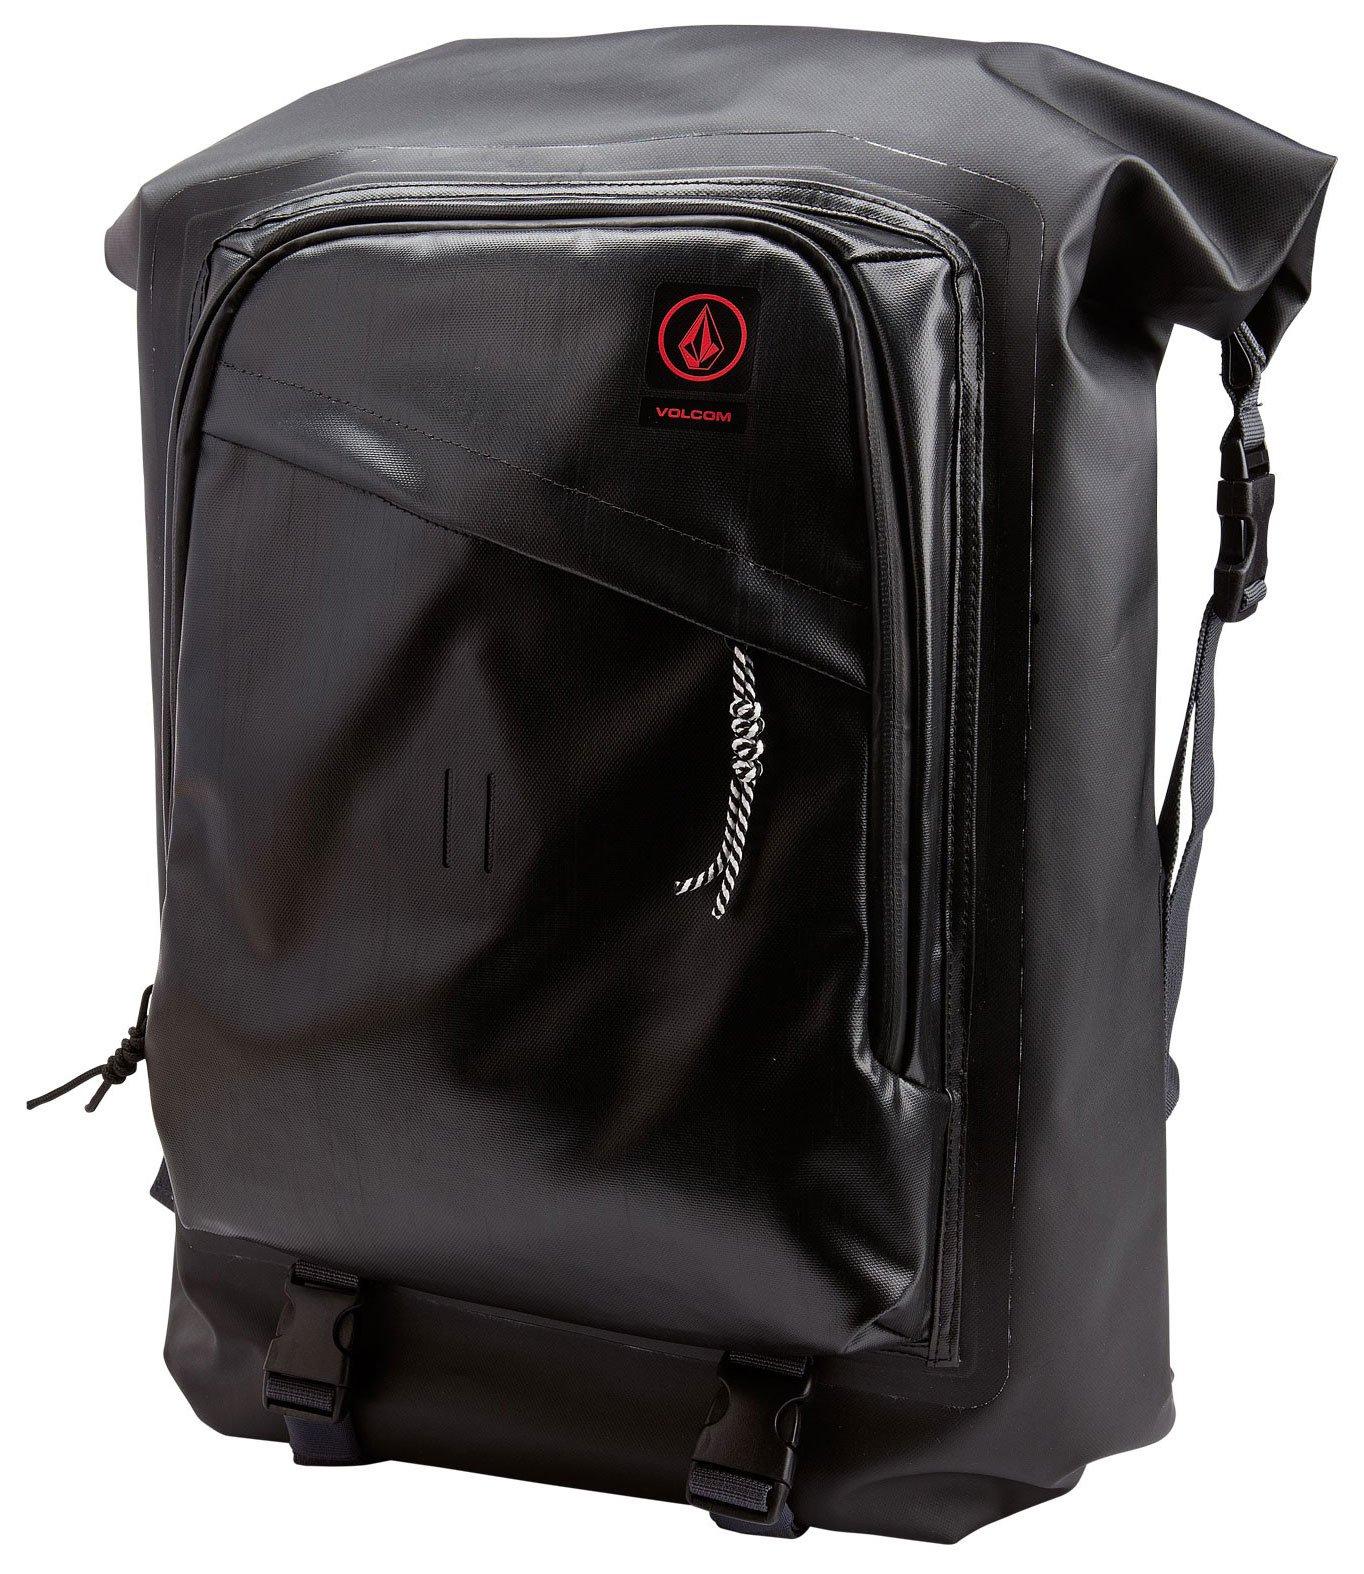 Volcom Men's Mod Tech Dry Bag, Black, One Size